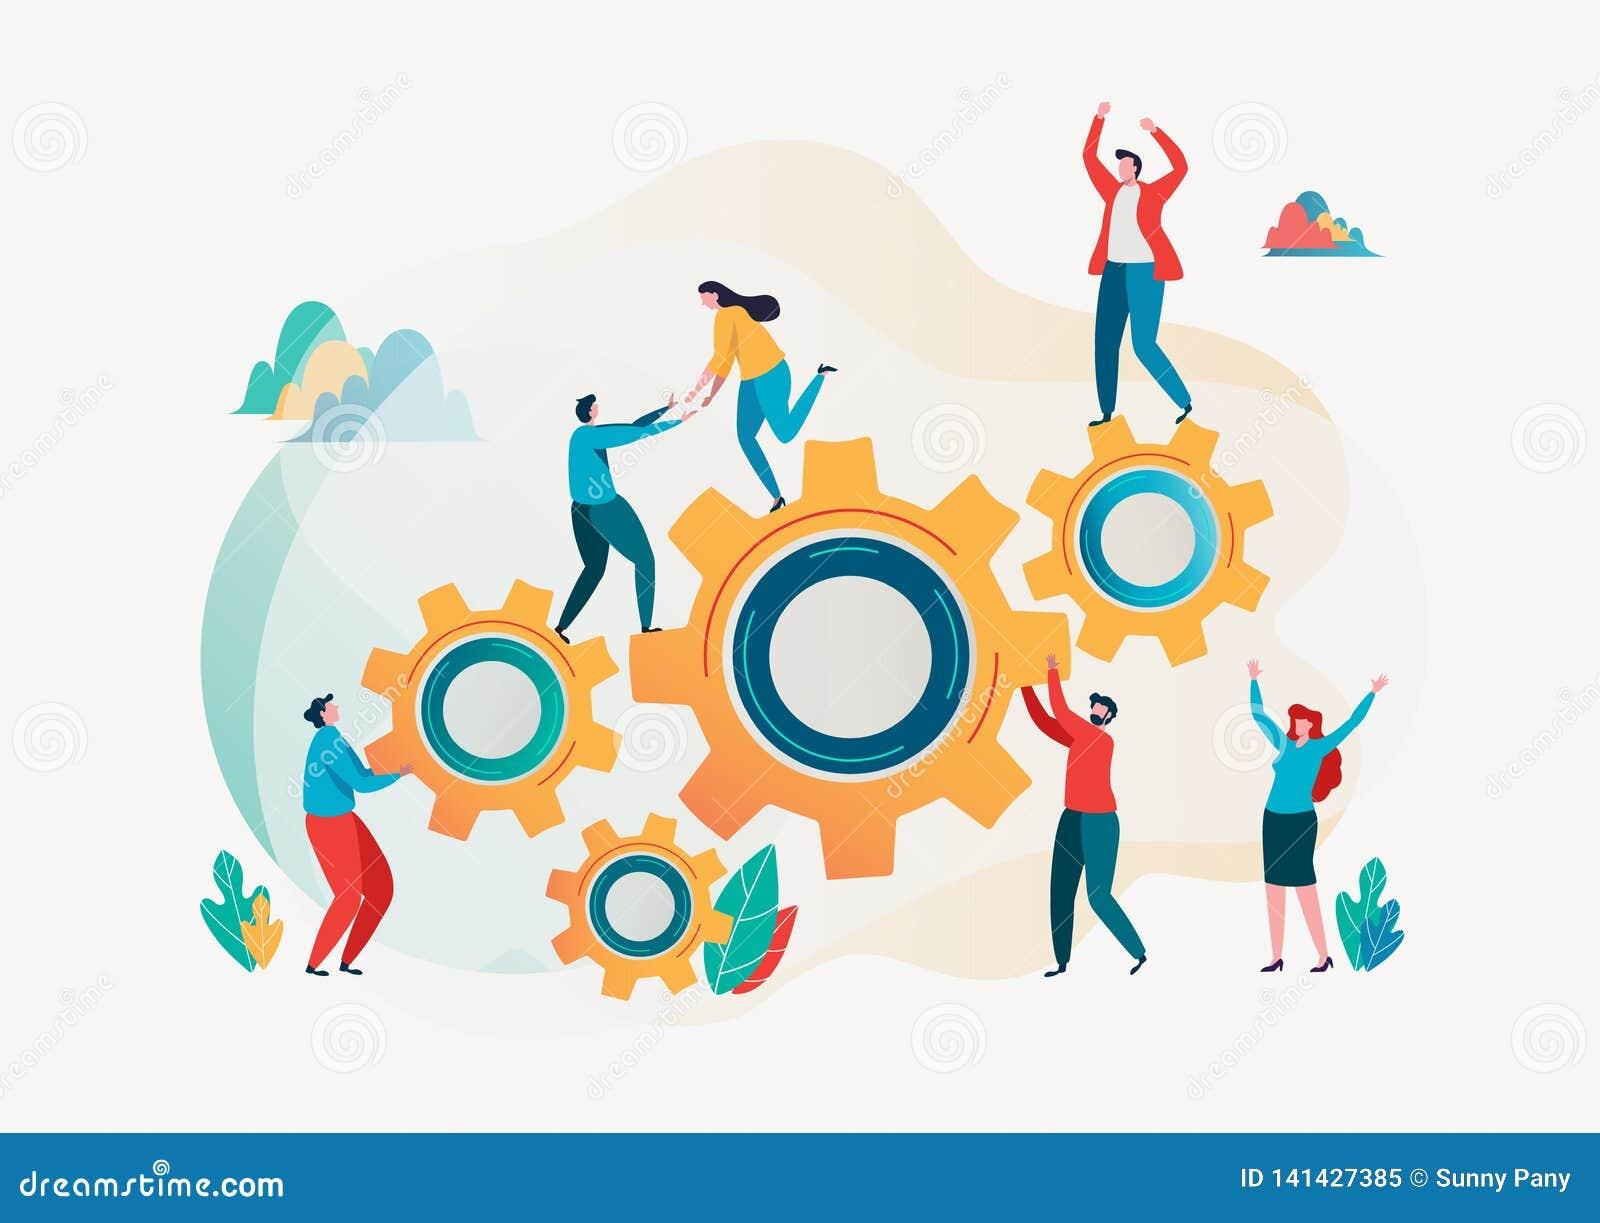 Teamwork concept. Team building. Team metaphor. Together concept. Vector illustration. Flat cartoon character graphic design.